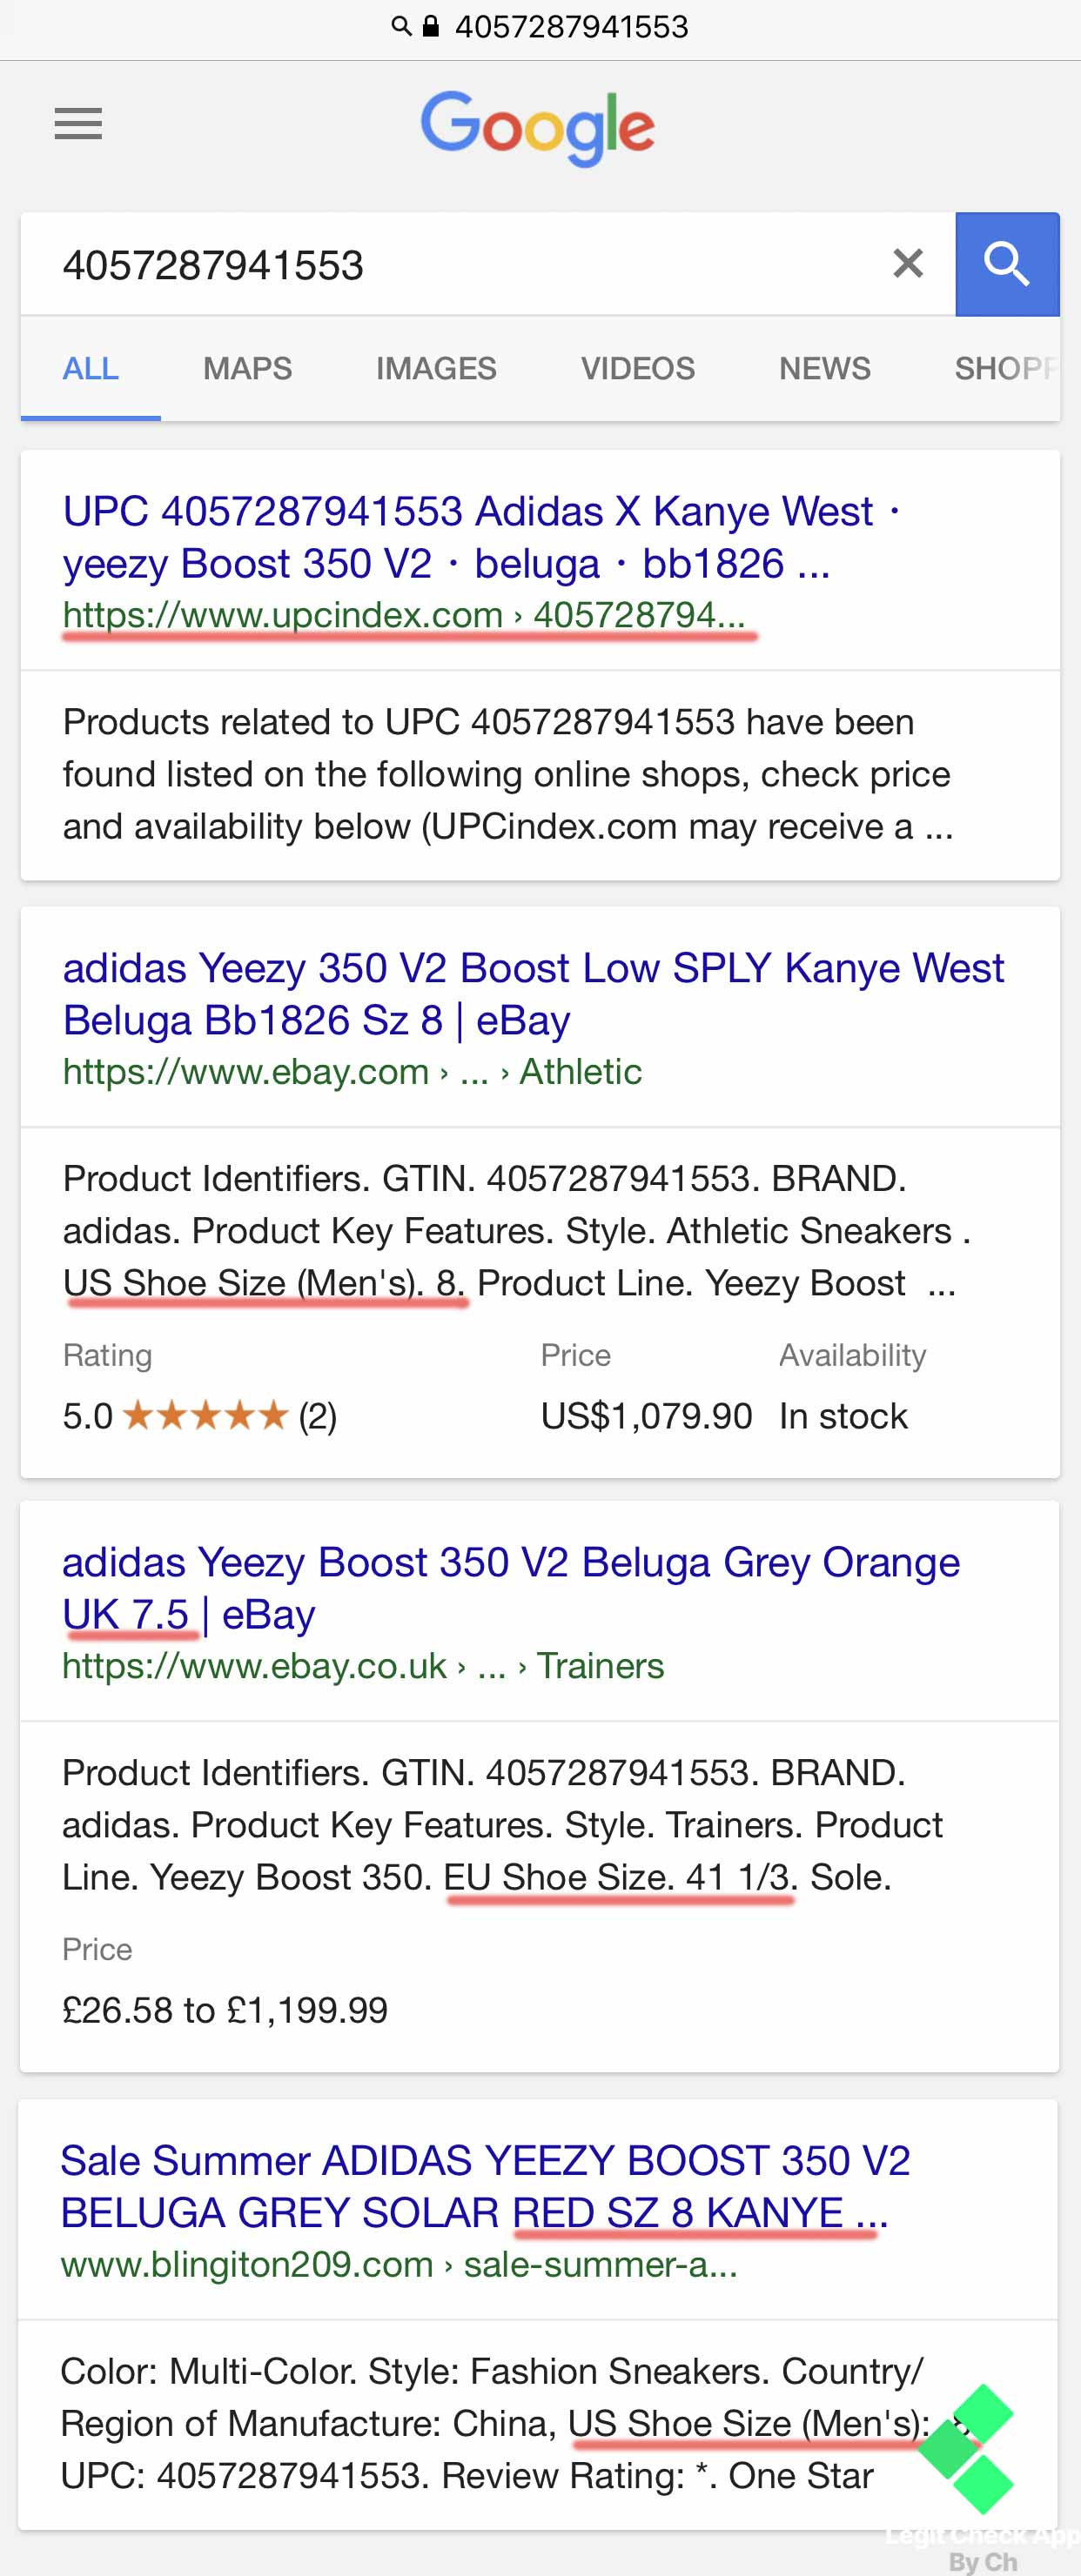 barcode orange ct address